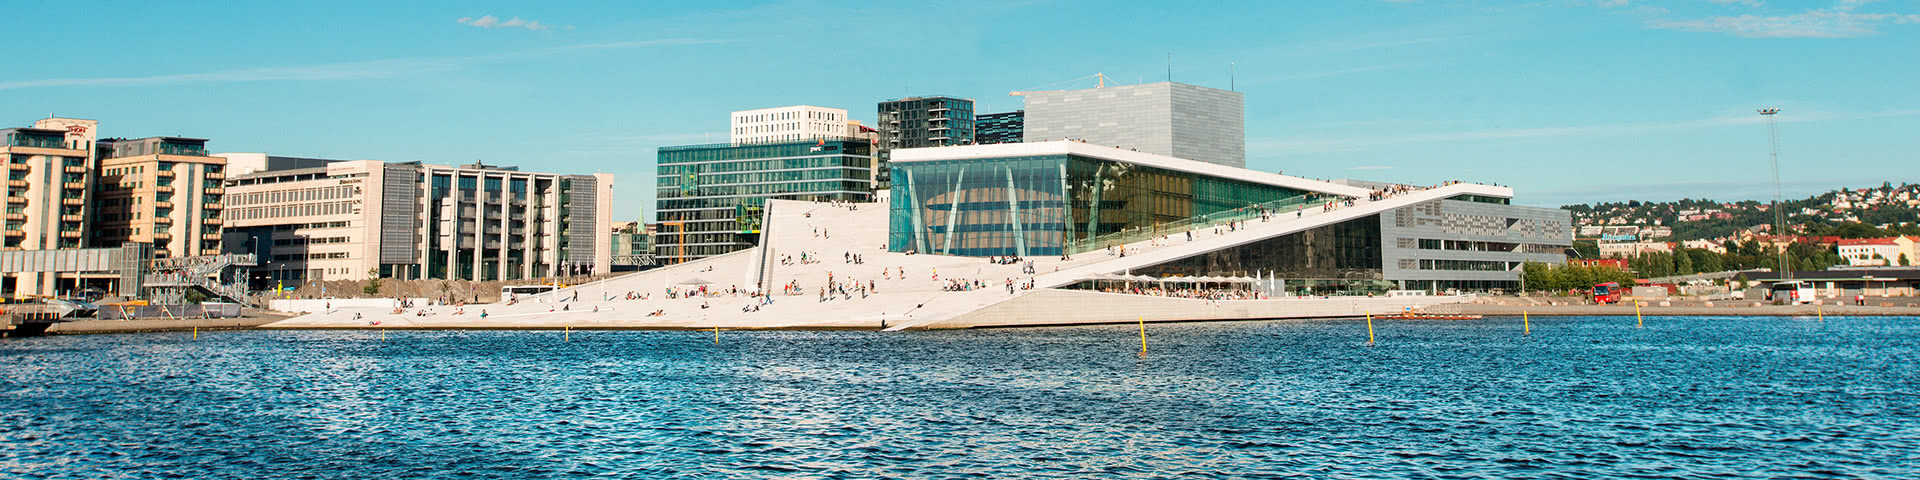 Blick auf die Oper in Oslo